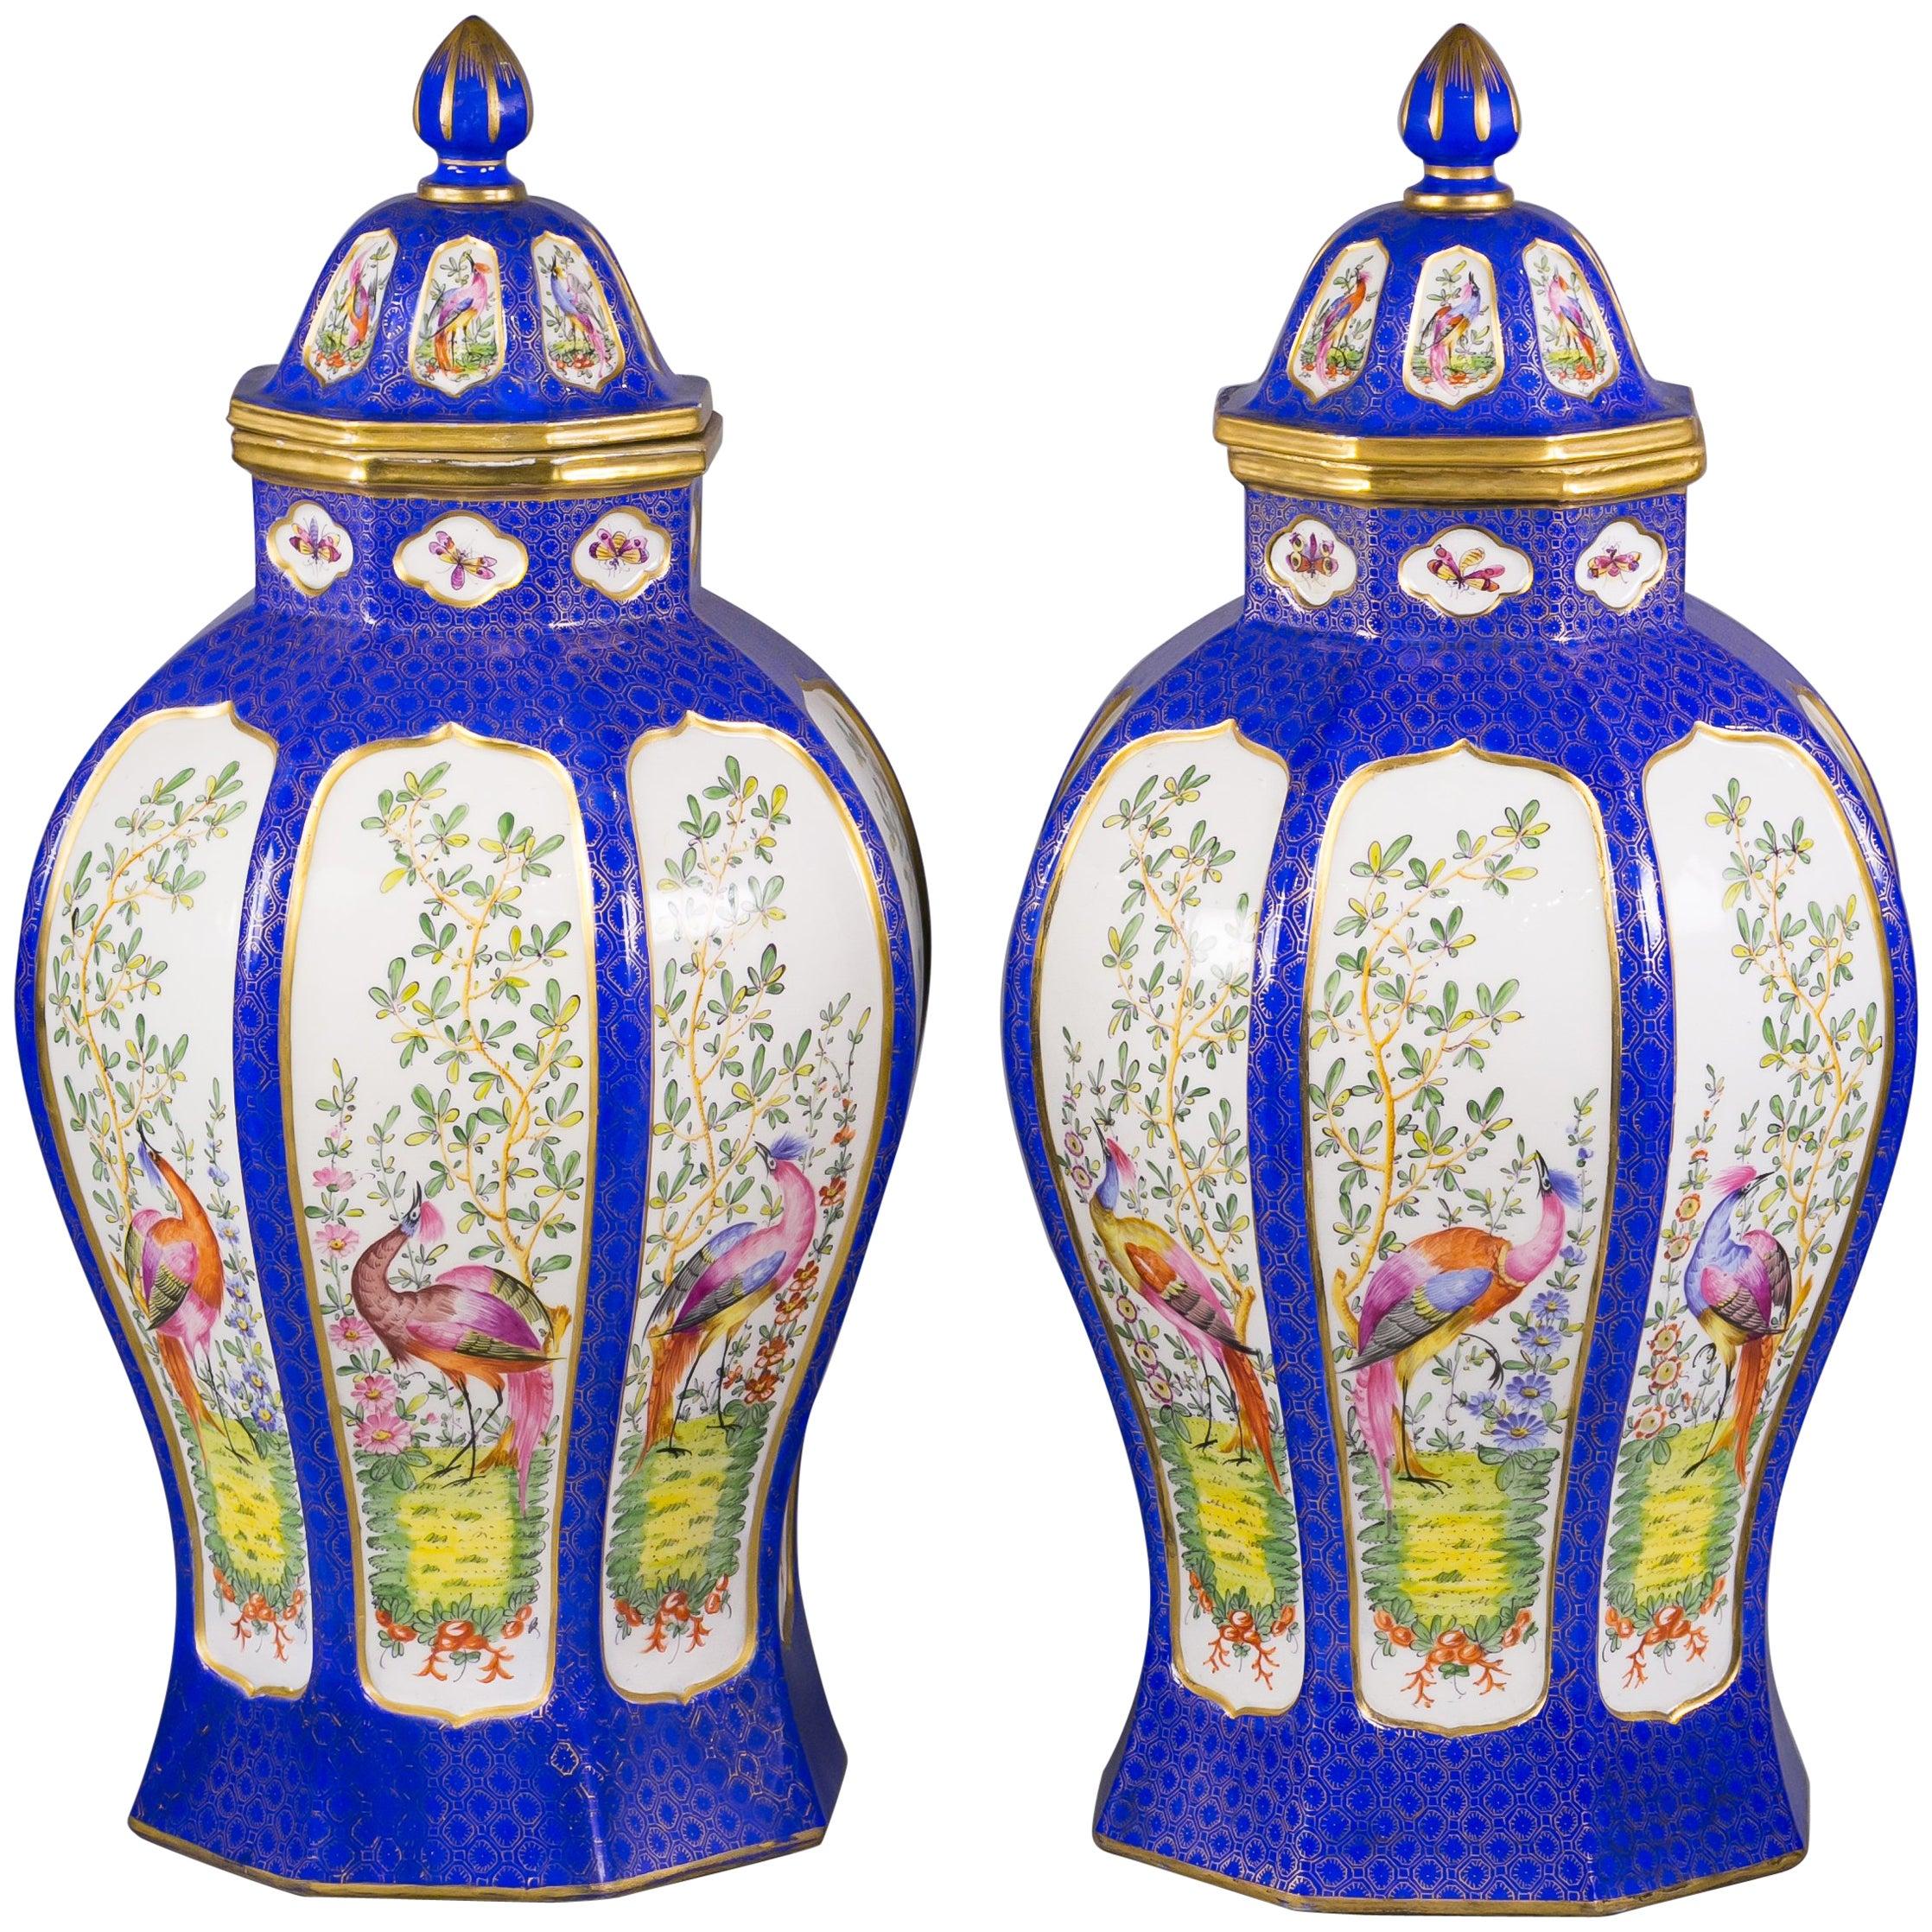 Pair of French Porcelain Covered Jars, Samson, circa 1880